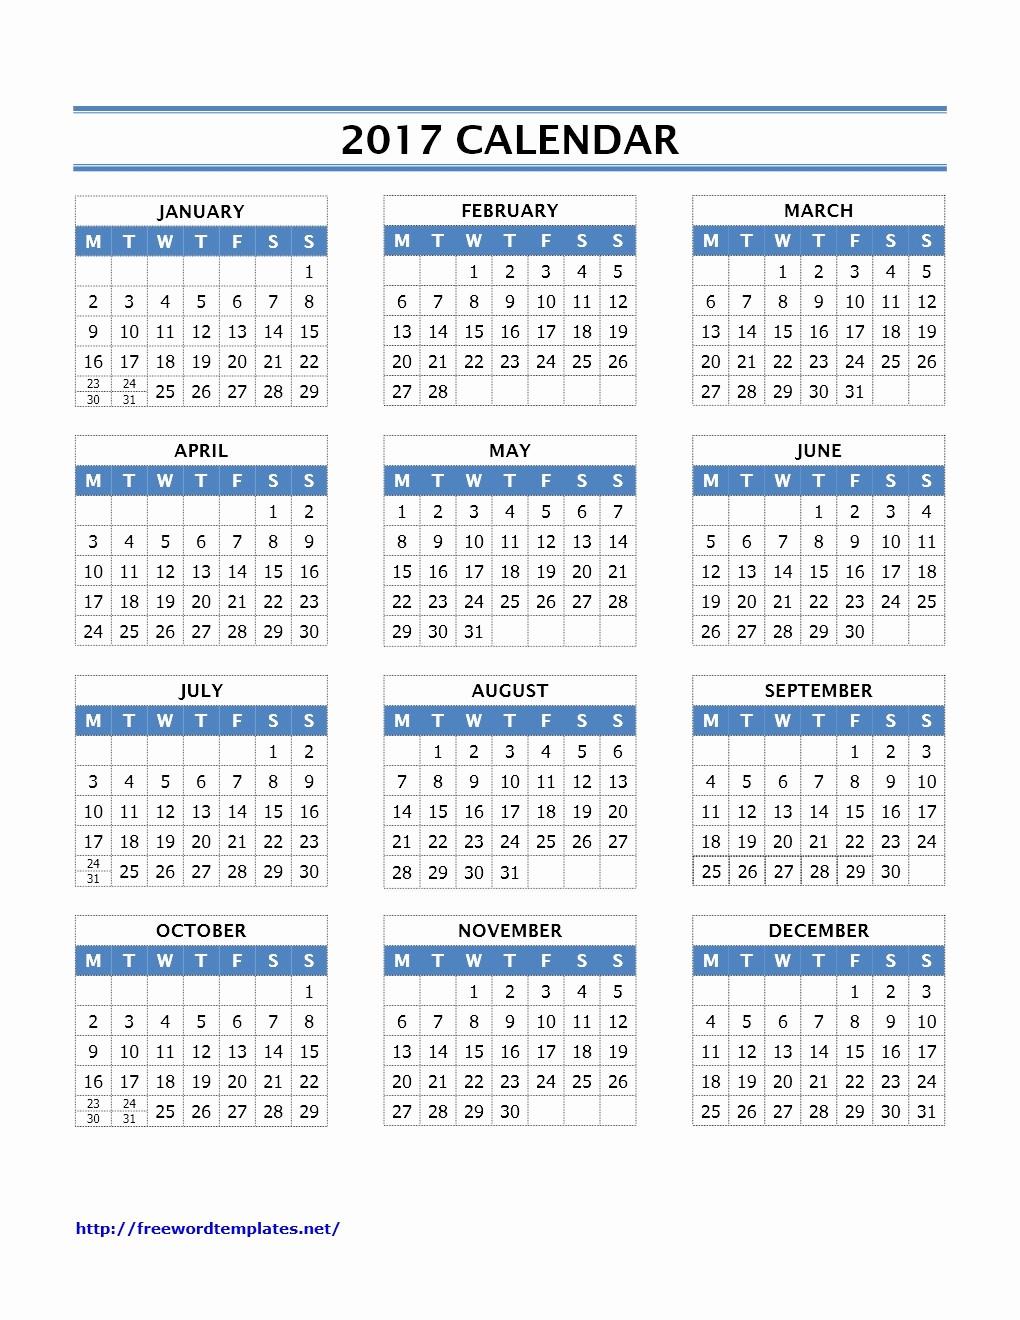 2017 Editable Calendar with Holidays Elegant Calendar Archives